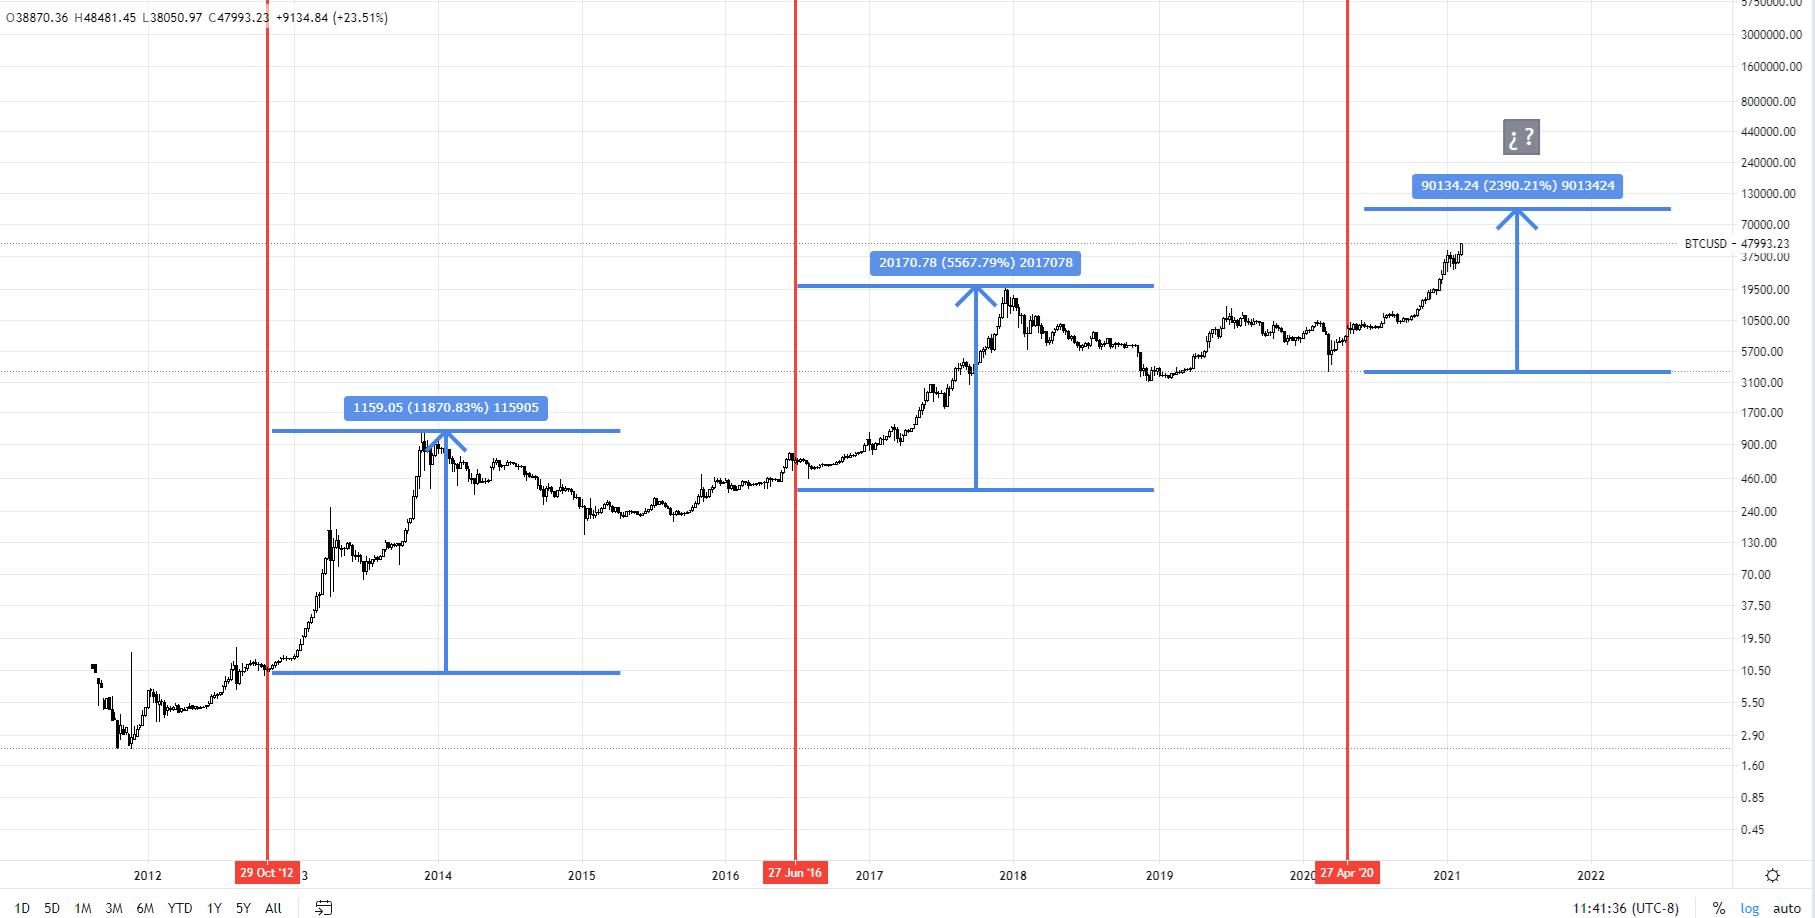 Bitcoin_semanal_logaritmico.png